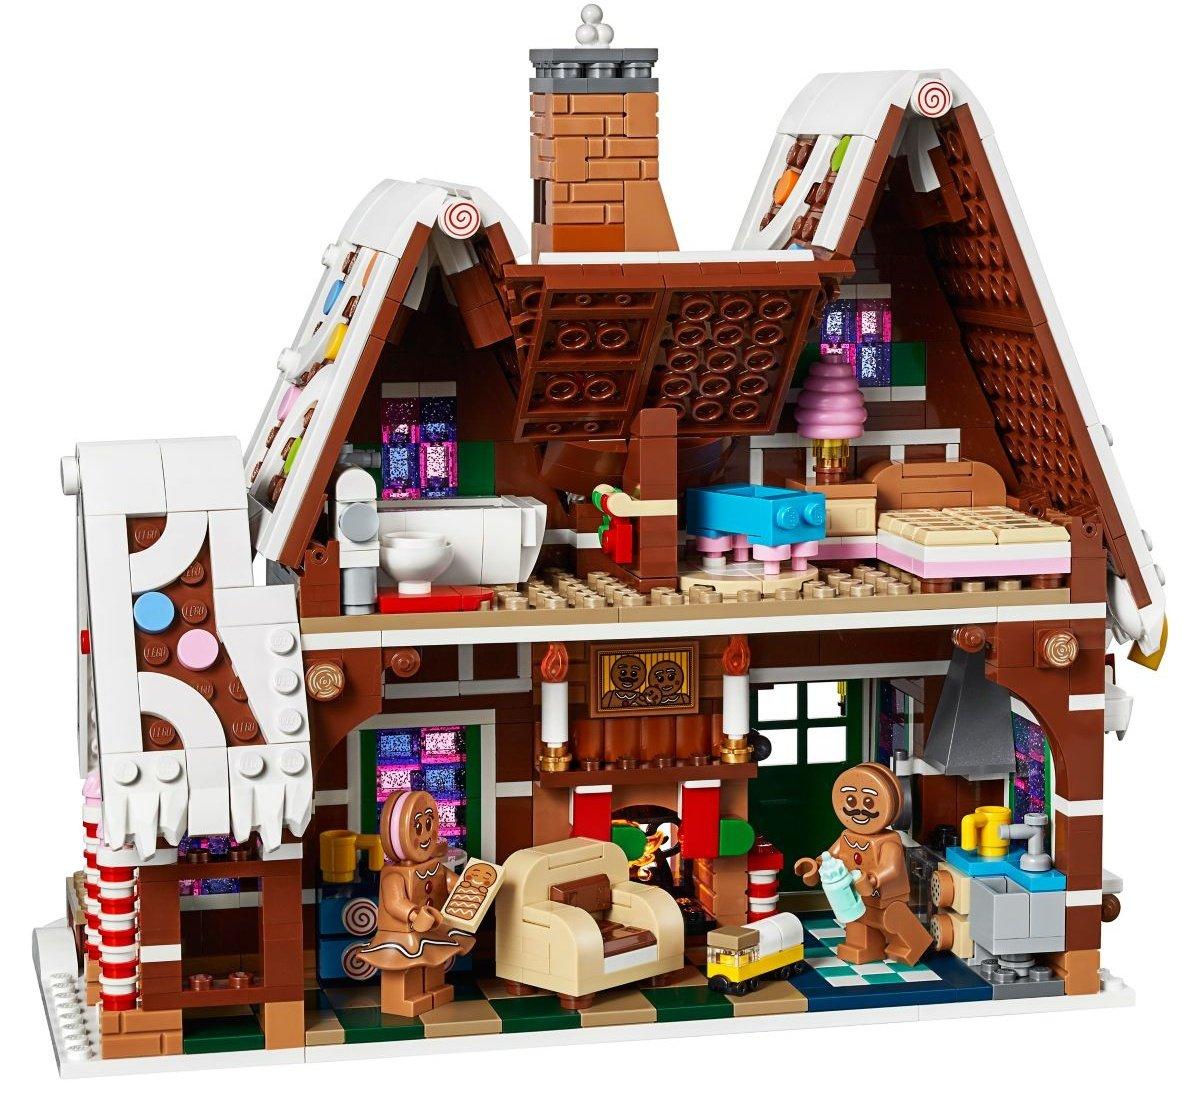 lego-creator-expert-10267-gingerbreadhouse-0004